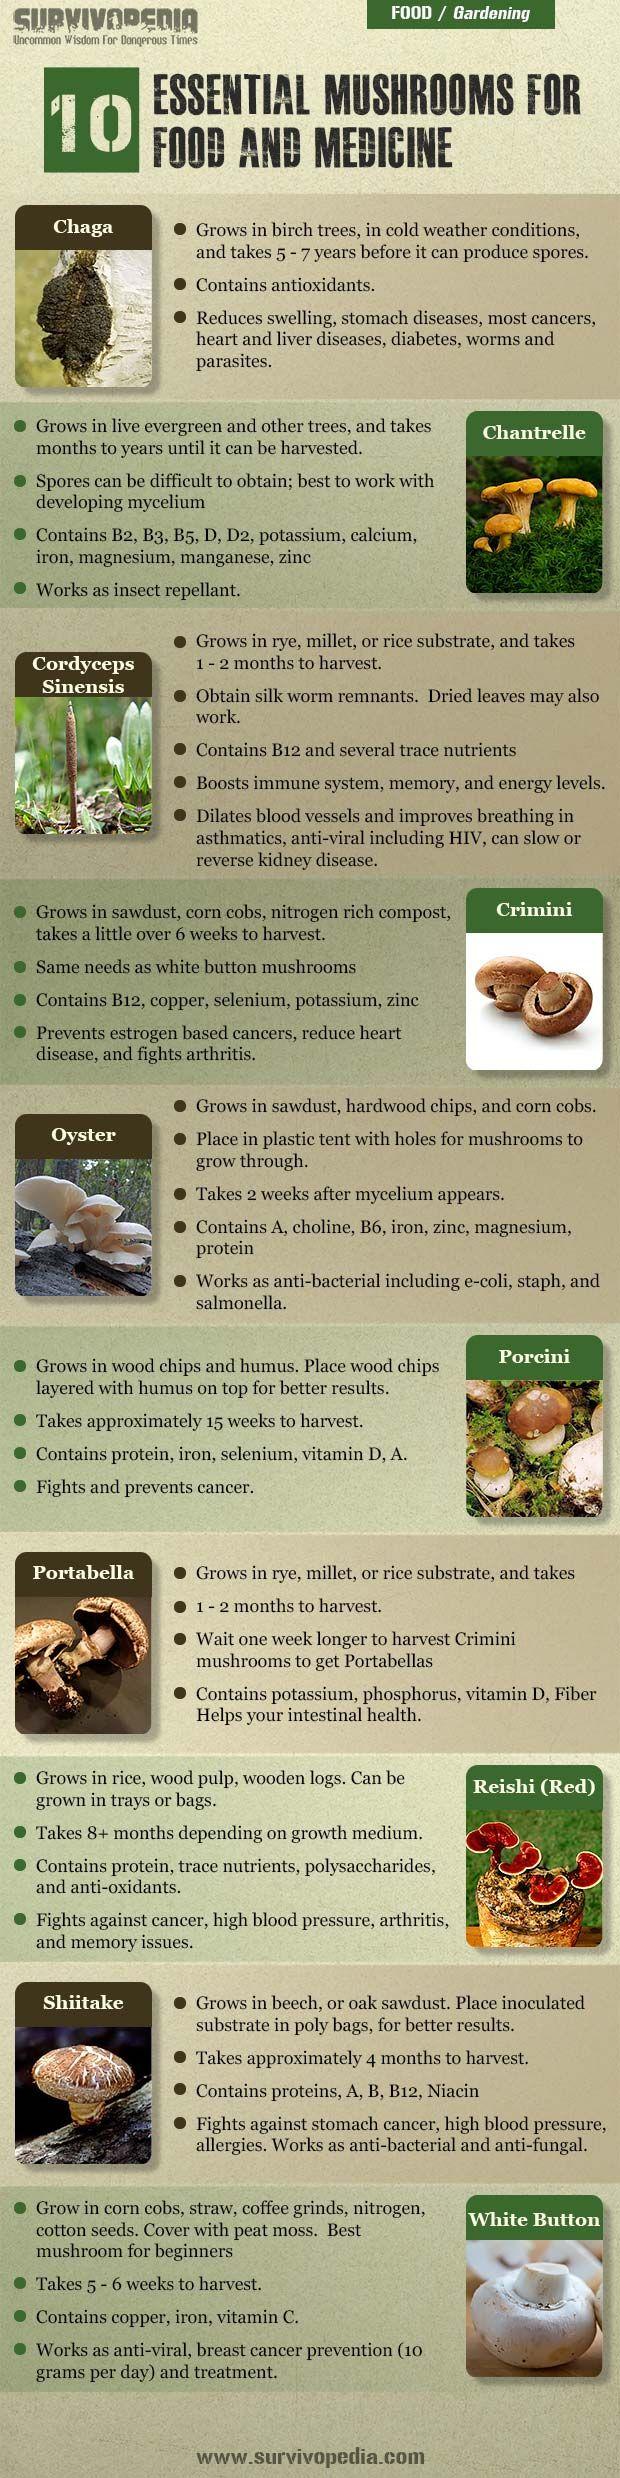 How to grow your own mushrooms | herbology, herbalism, healing plants, herbal medicine